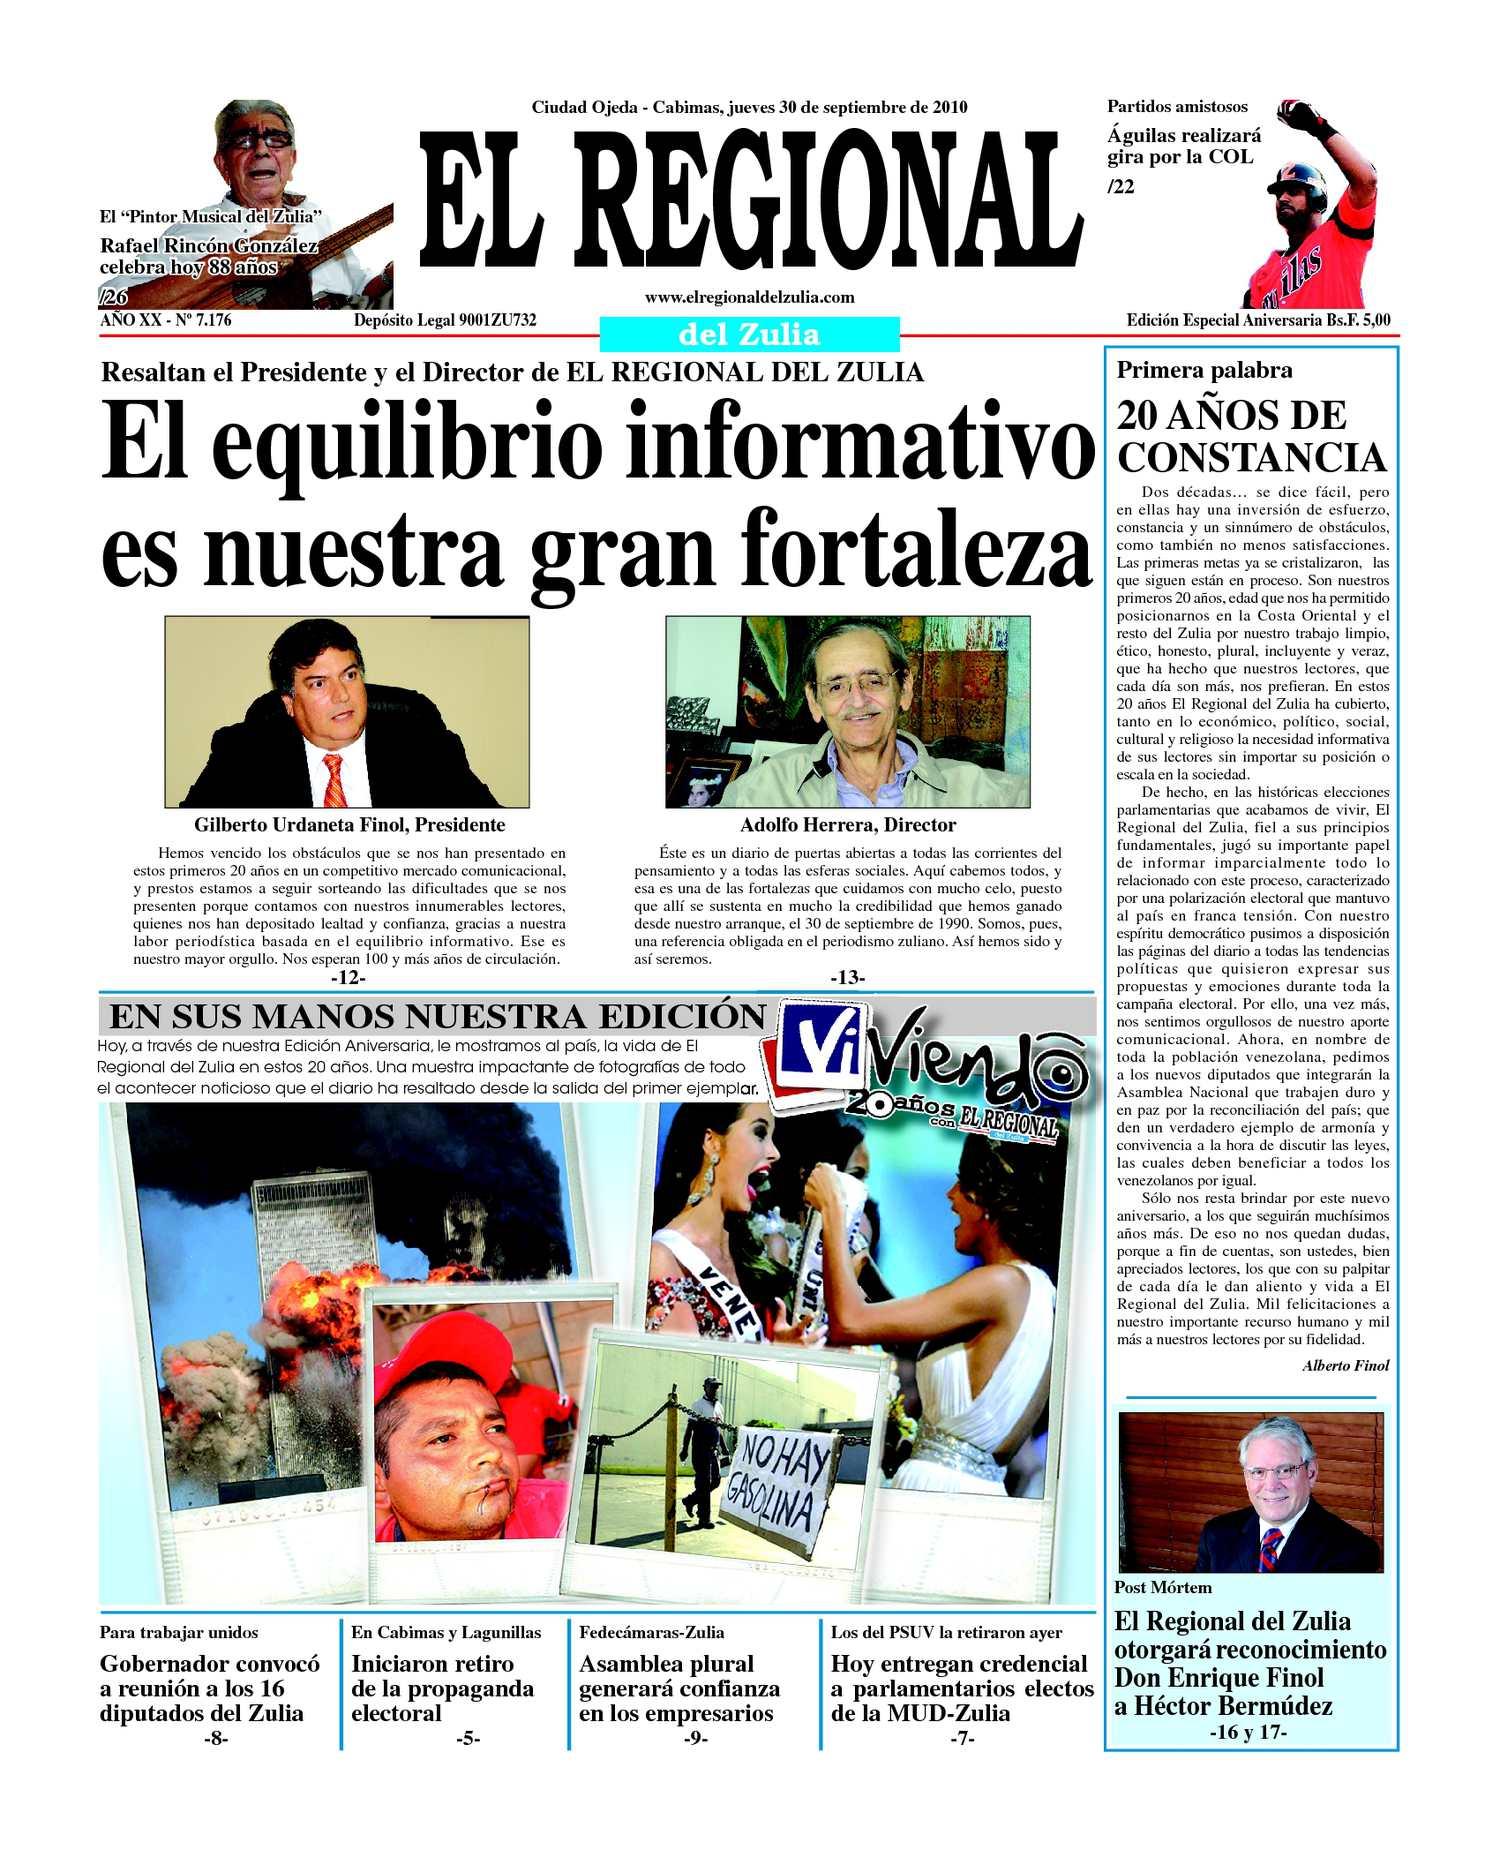 Calaméo - El Regional del Zulia 30-09-2010